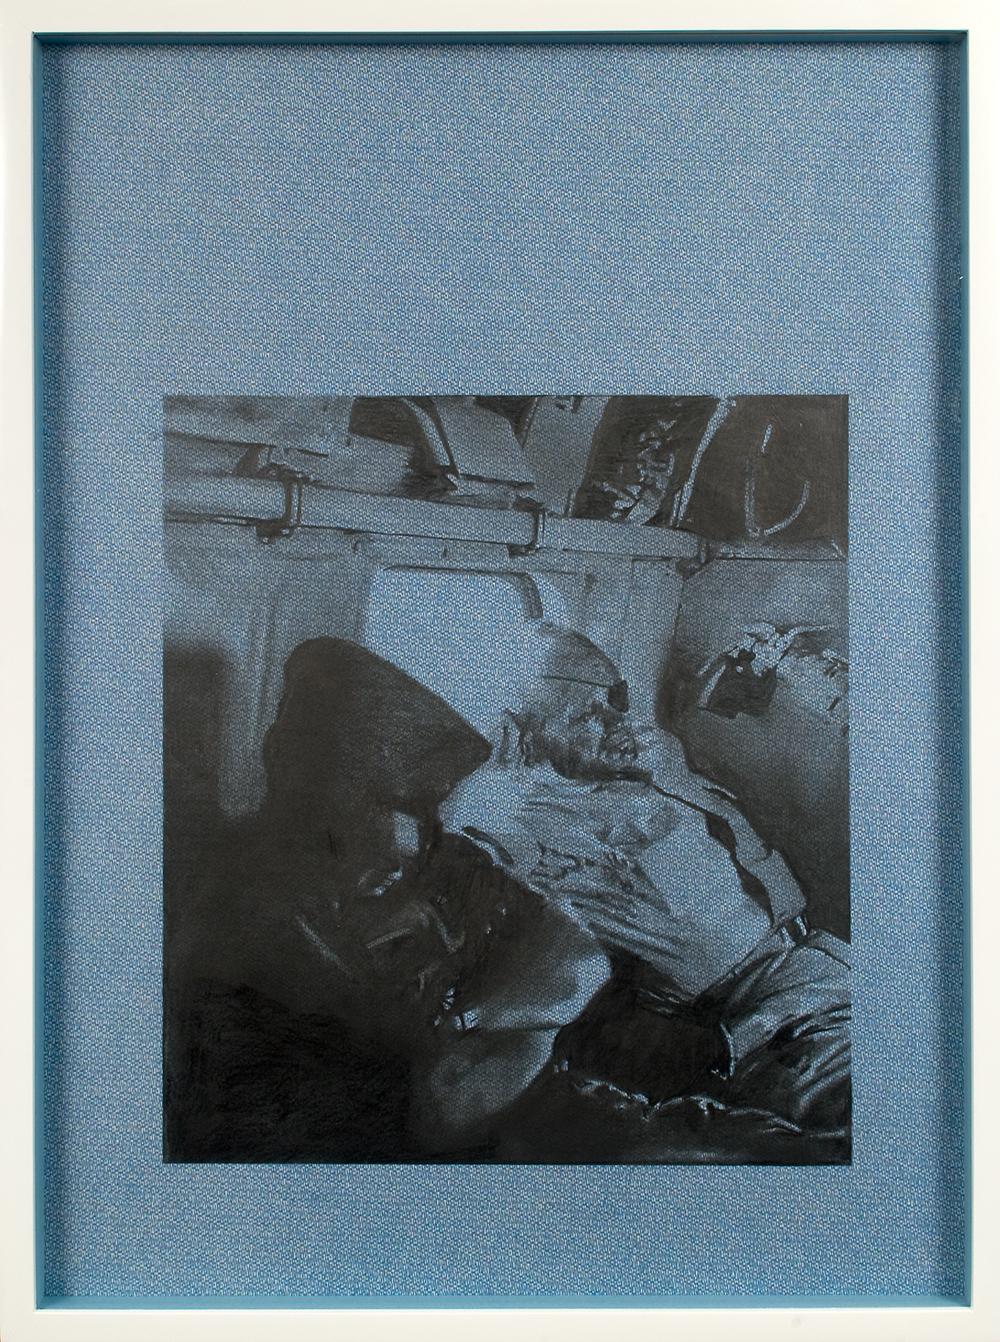 "no.34- Untitled (Yitzak Rabin) pencil on paper, ink jet print, 21""x28""/ 53cmx71cm,            2007/08"